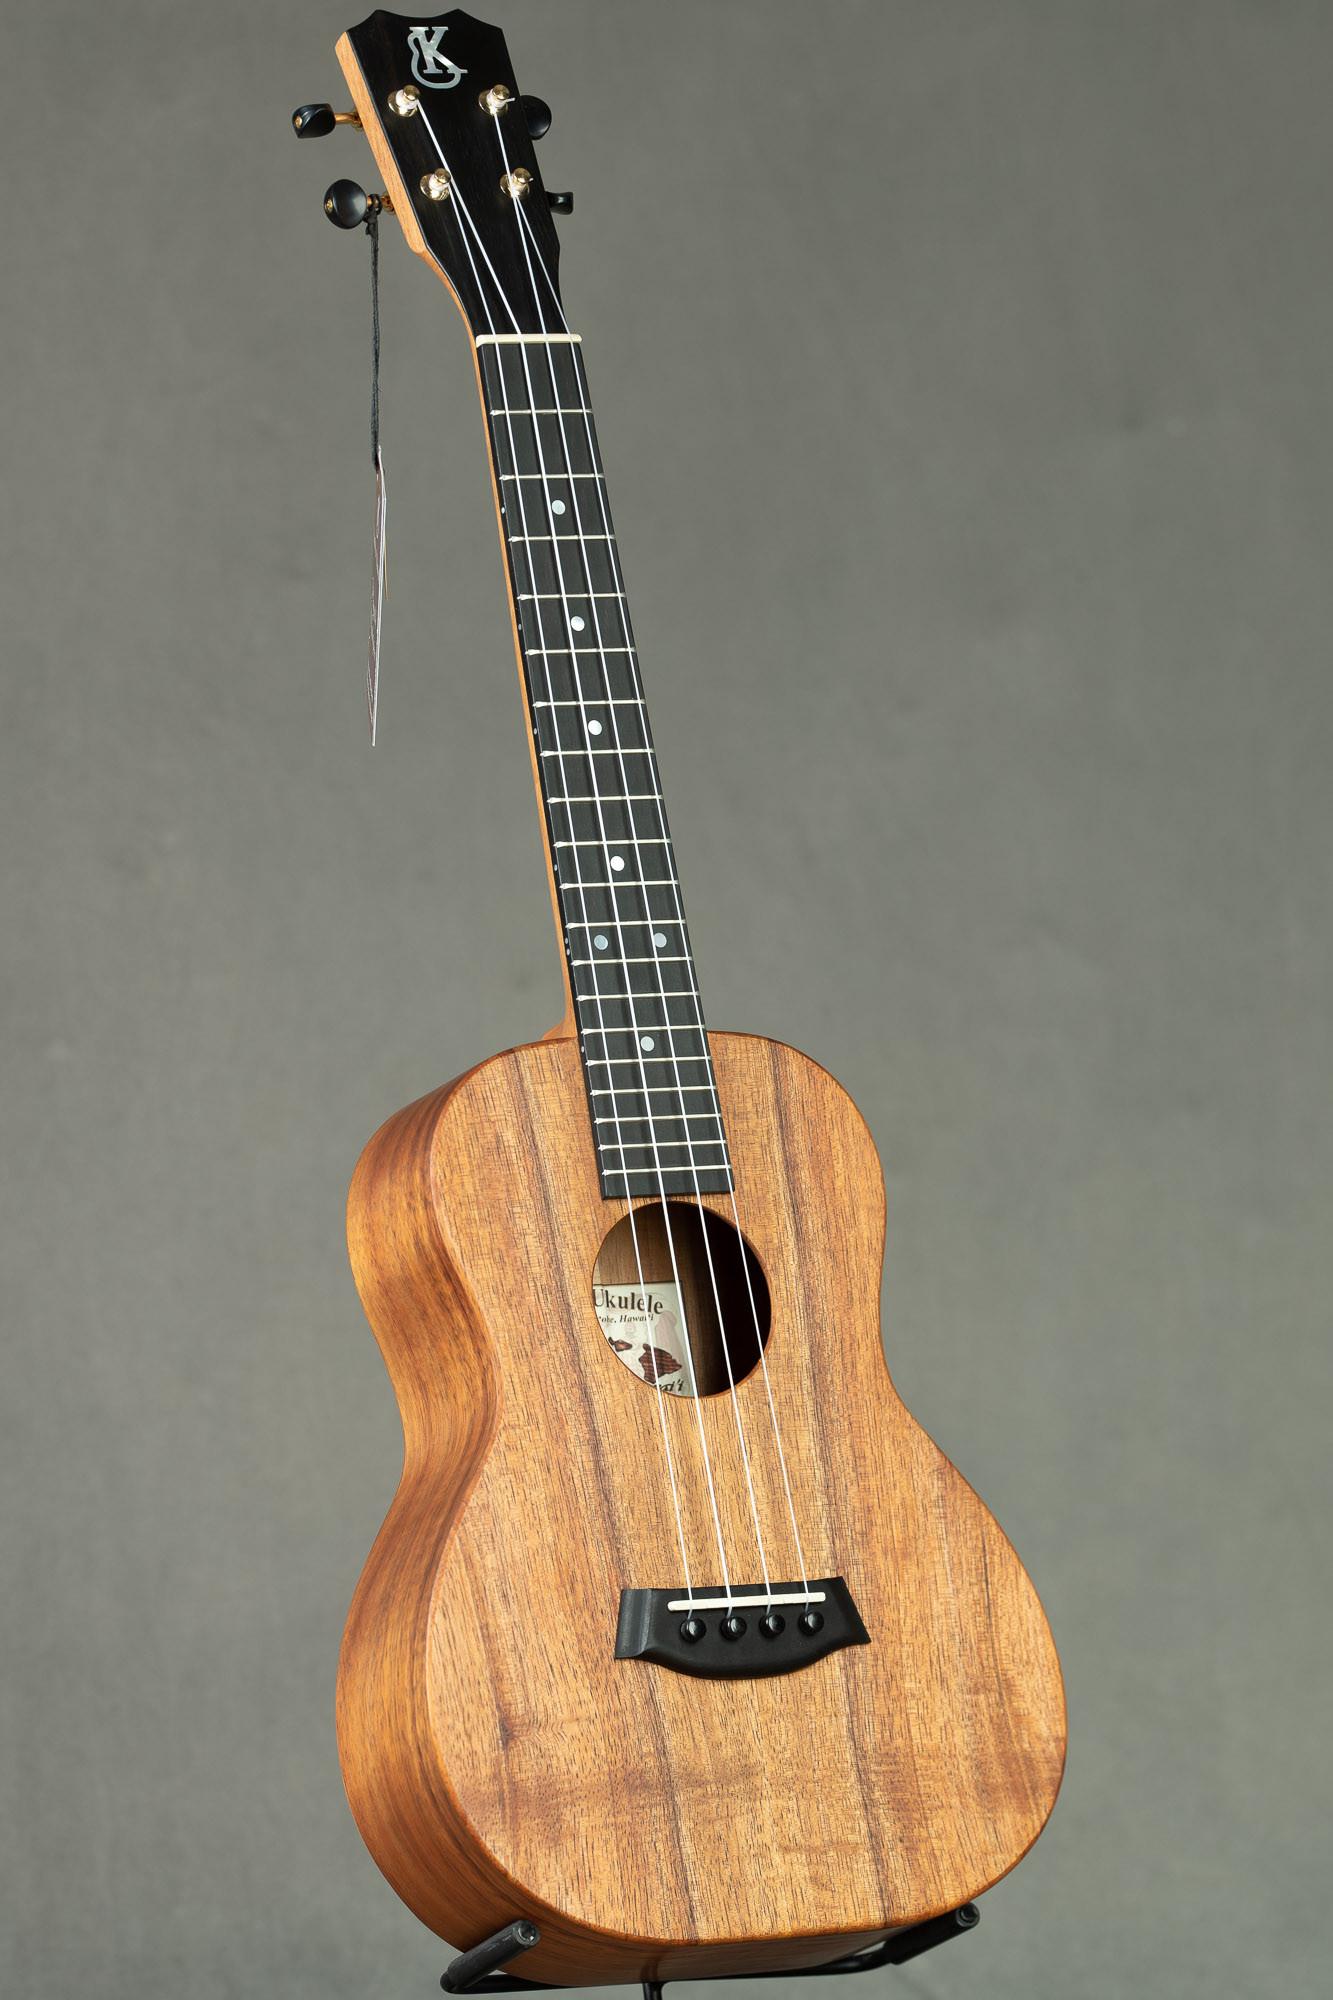 Kanile'a Koa Tenor (K-1 T UV Natural Tru-R, Select from Available)